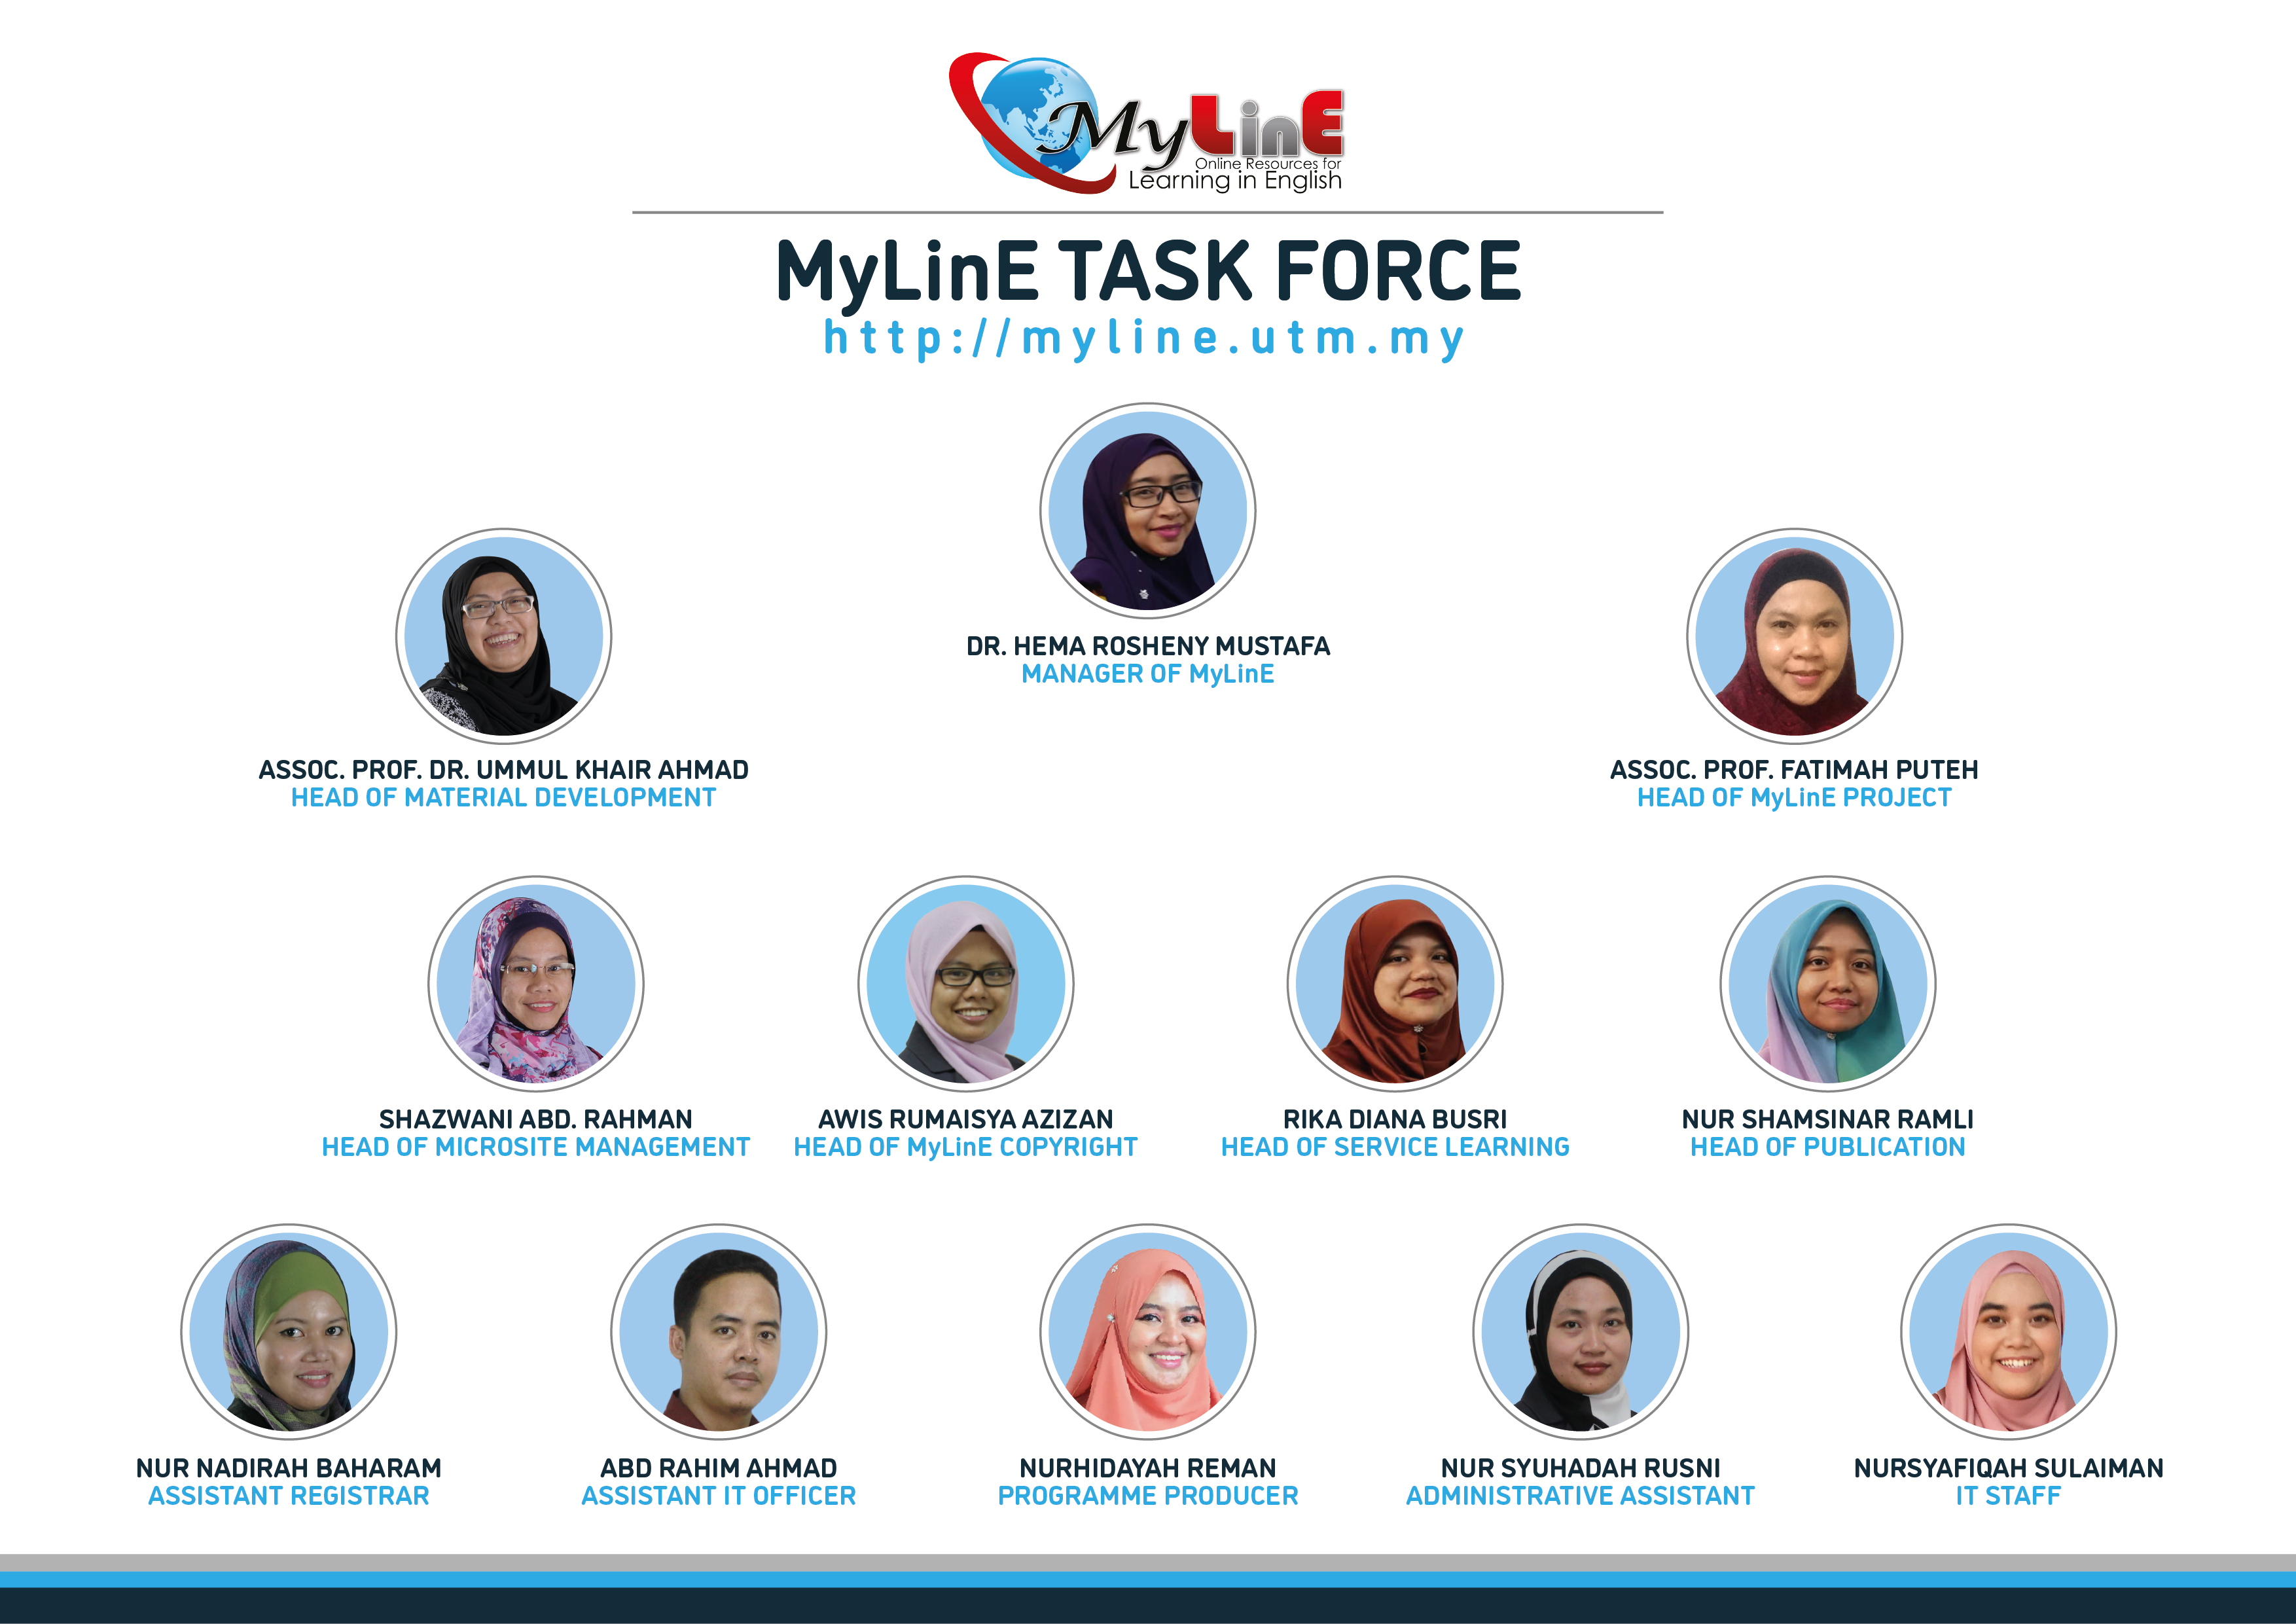 MyLinE Task Force